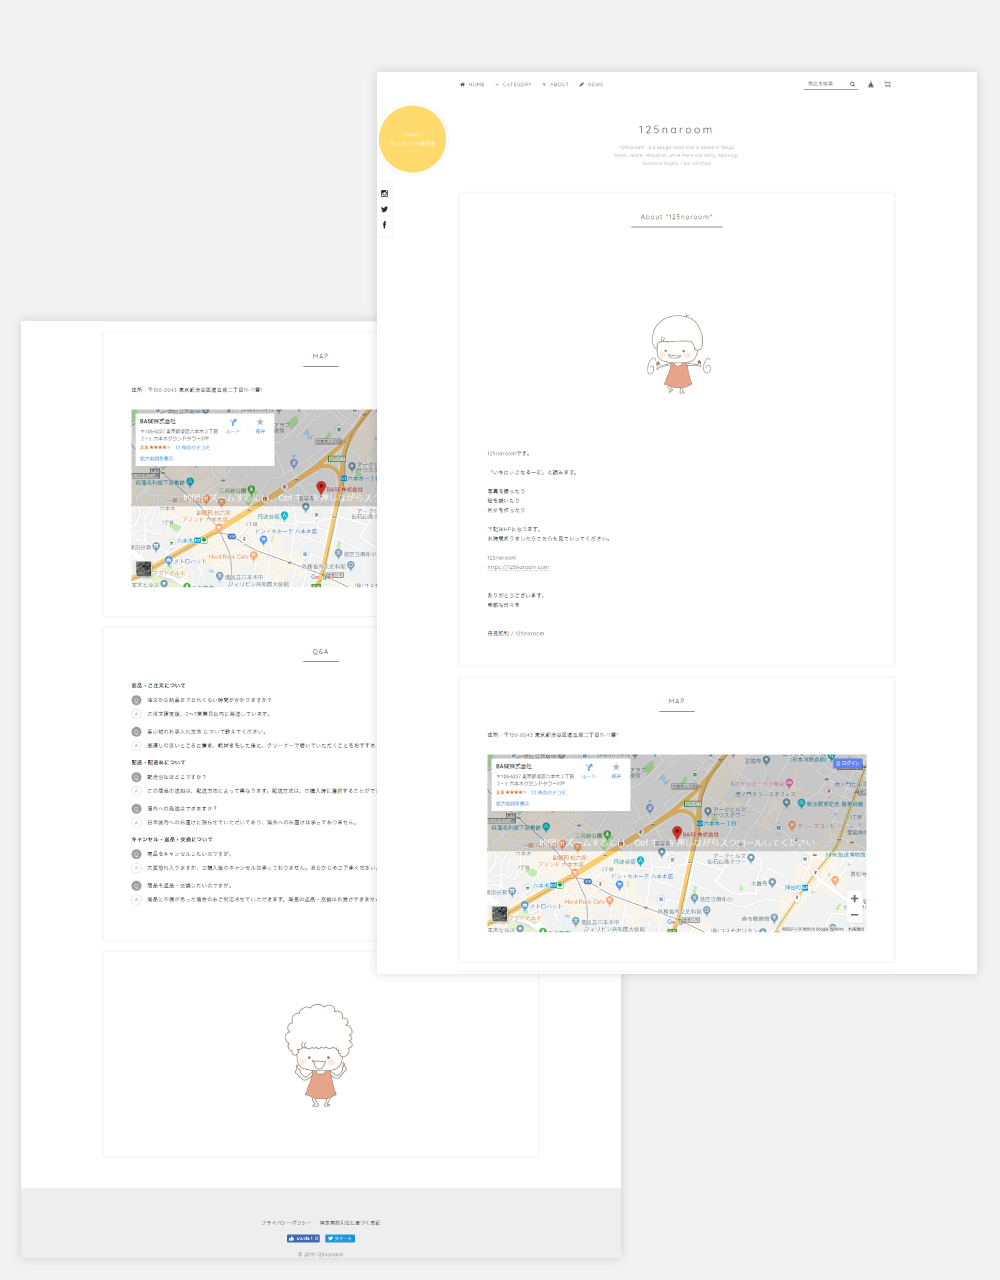 fuwari | BASE デザインマーケット ネットショップのデザインをもっと自由に